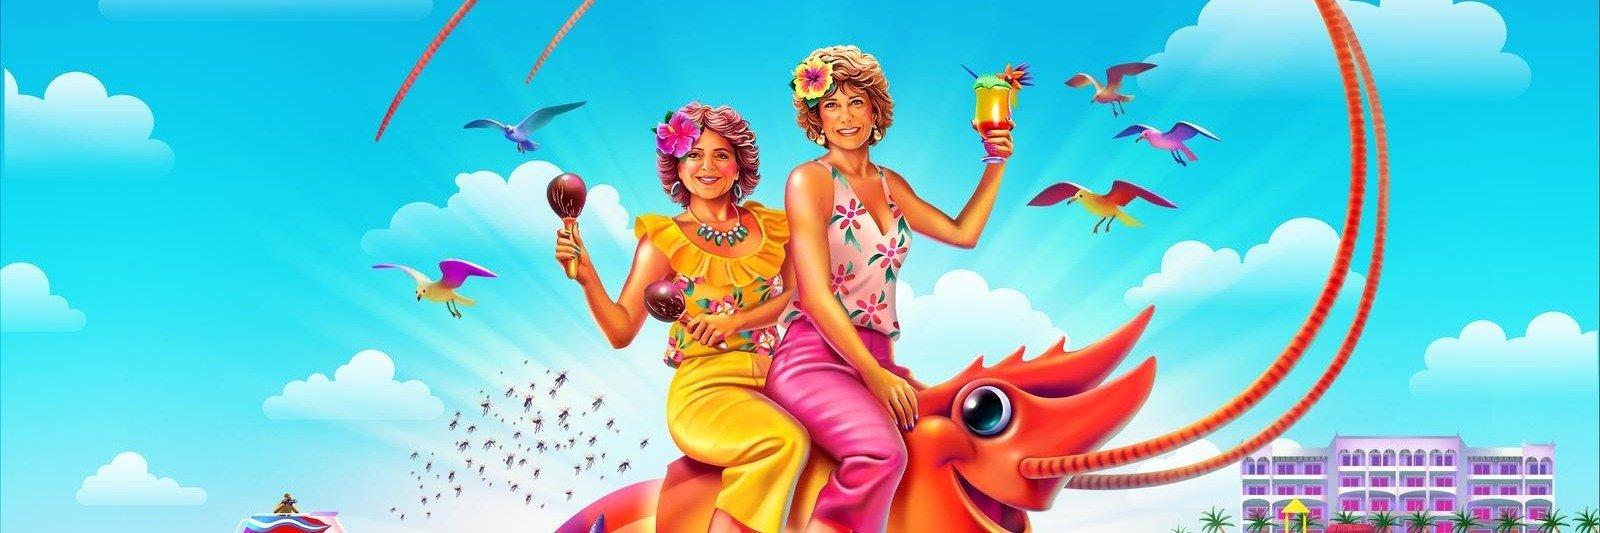 Przedstawiamy: Barb & Star Go to Vista Del Mar (Original Motion Picture Soundtrack)